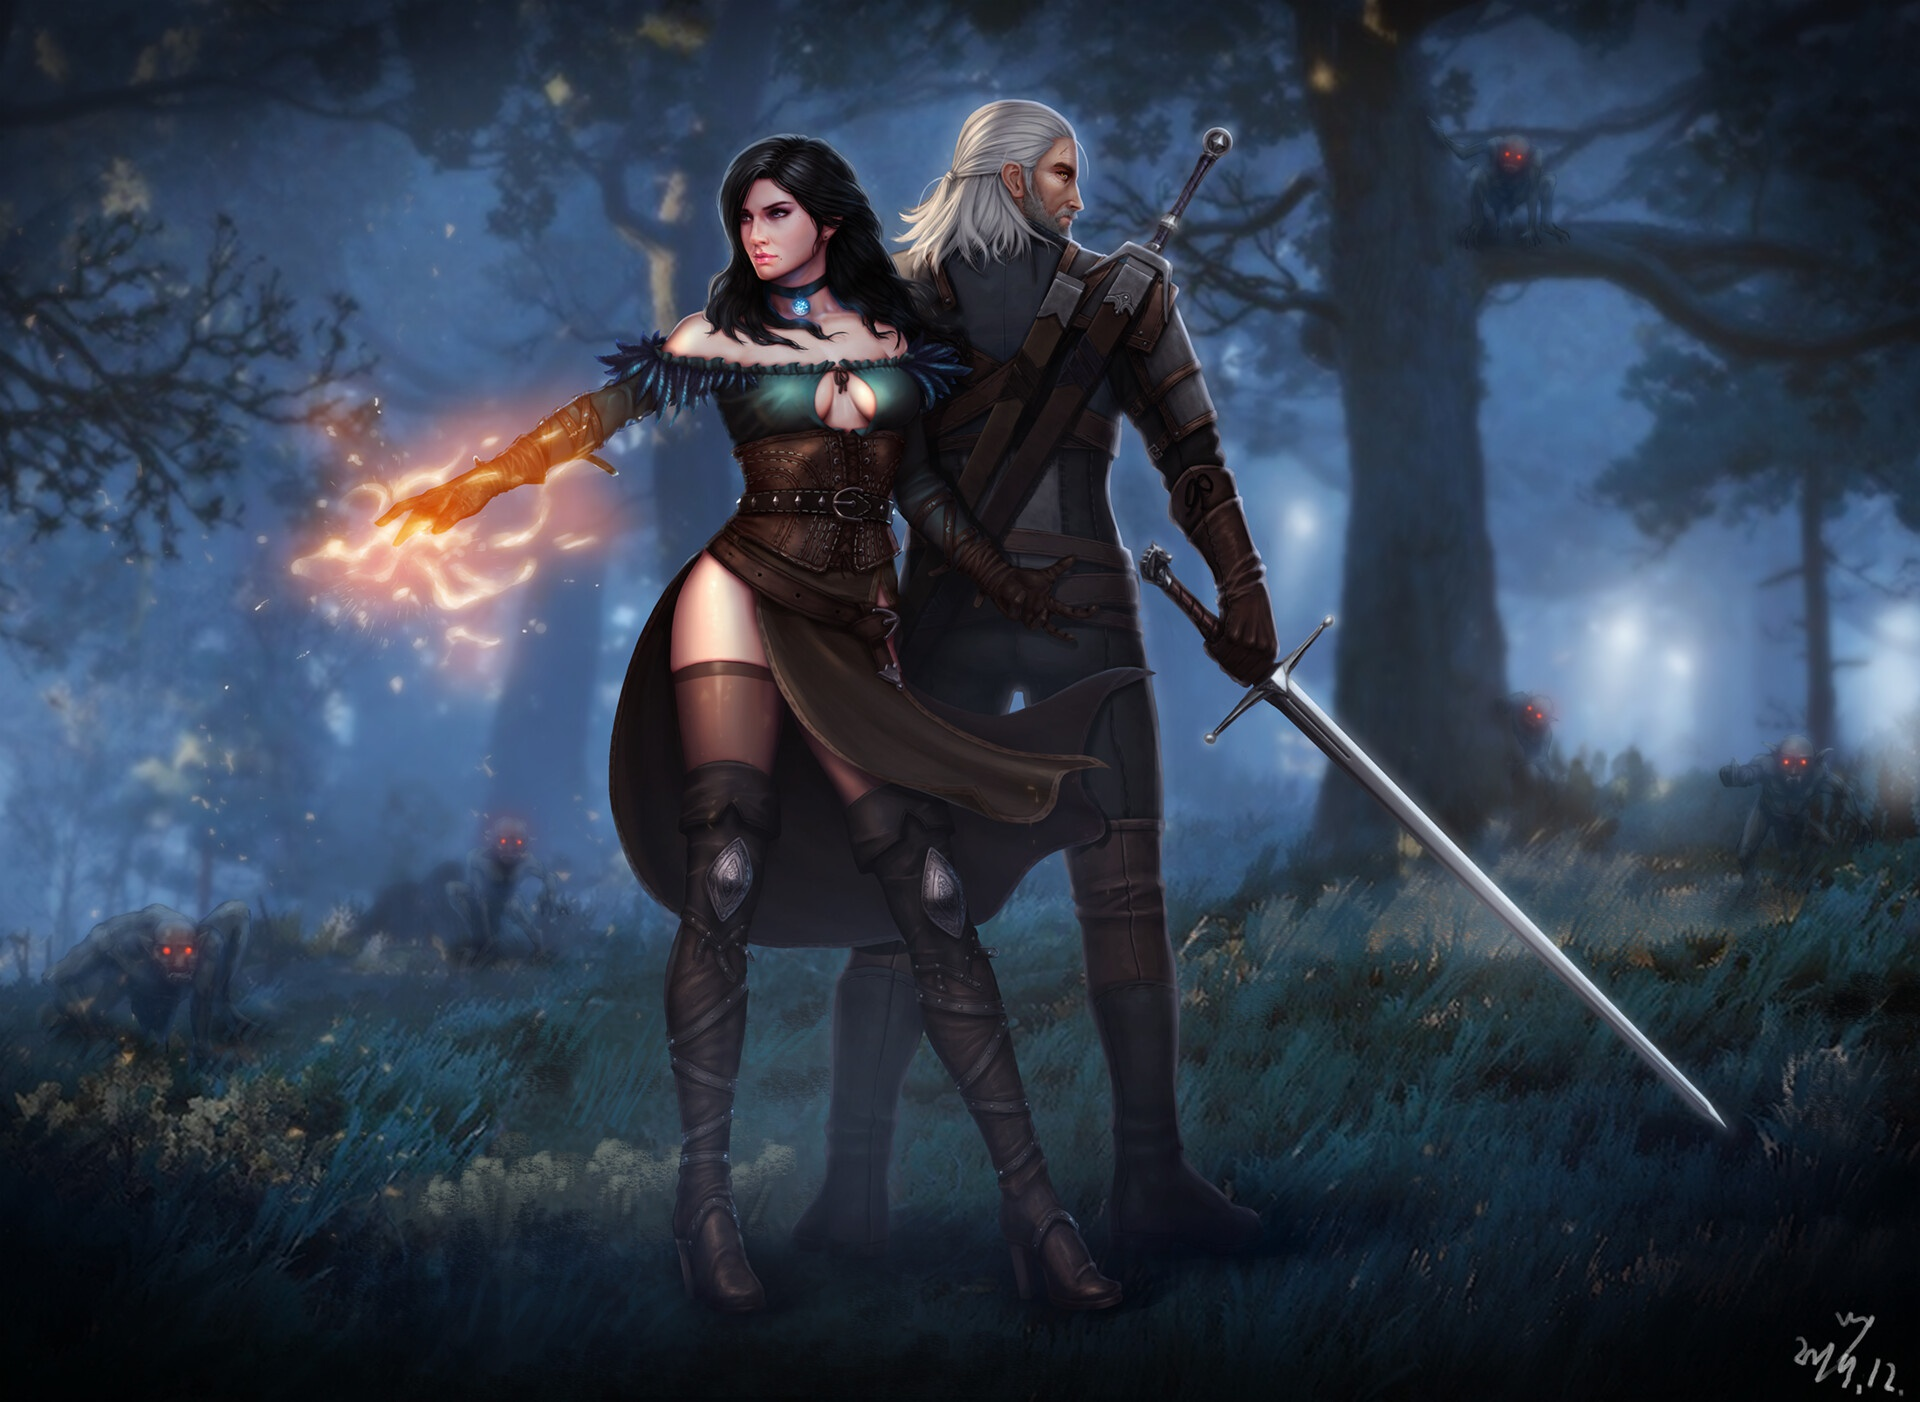 General 1920x1402 Wang Yong RPG Geralt of Rivia The Witcher 3: Wild Hunt video game art fantasy art Yennefer of Vengerberg